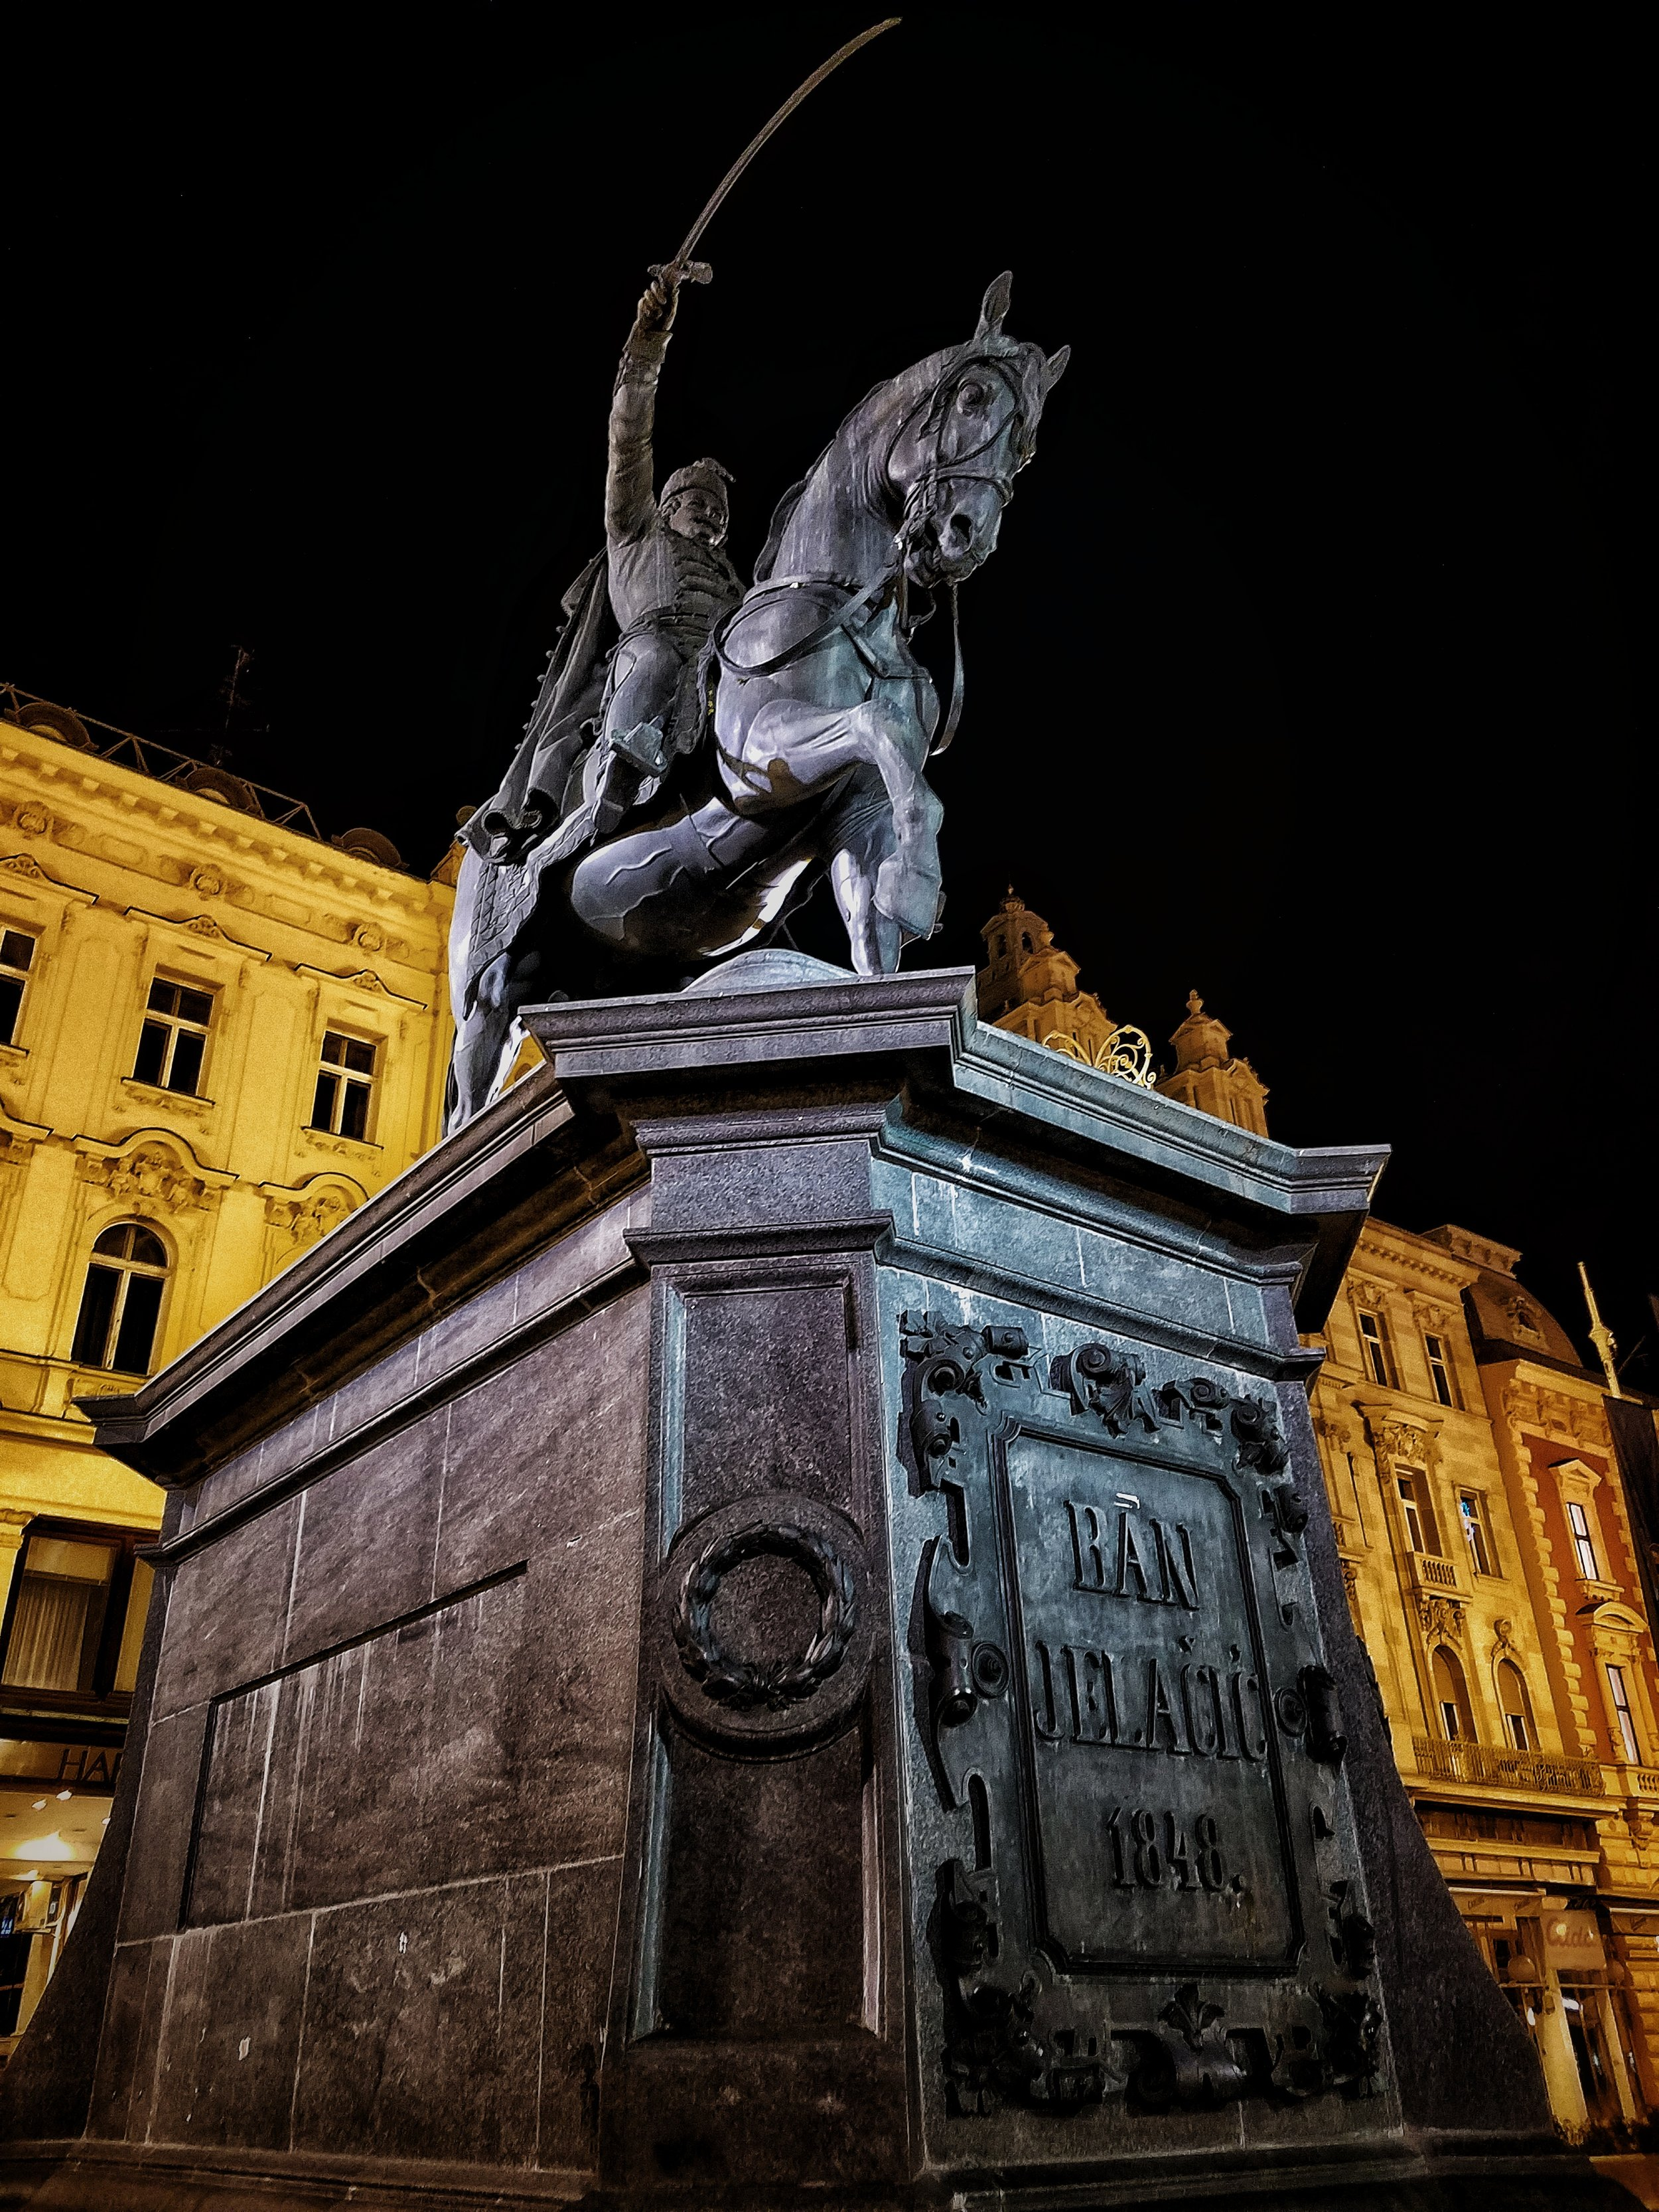 Ban Jelacic Statue